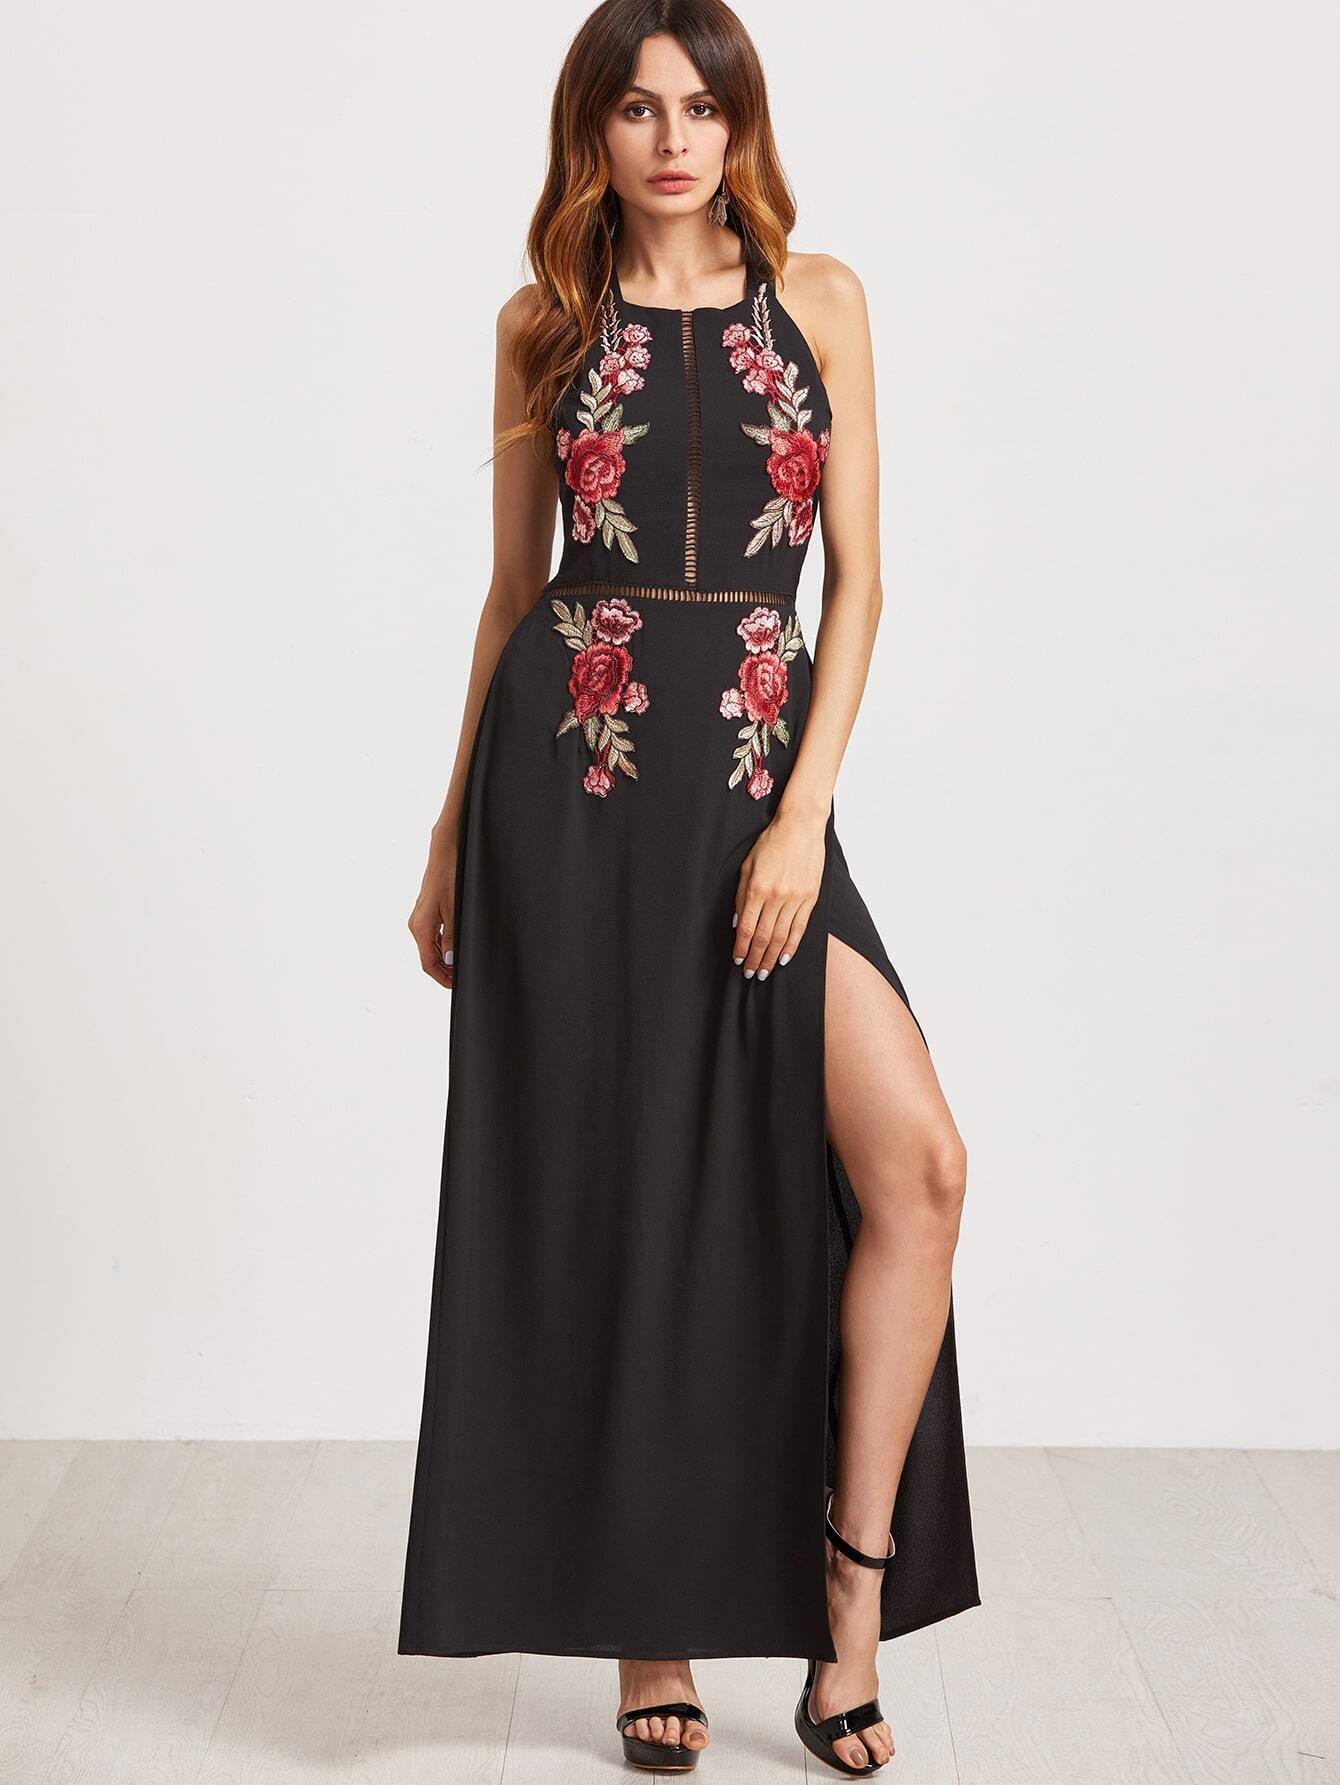 Black Backless Hollow High Slit Appliques Dress EmmaCloth-Women Fast ...